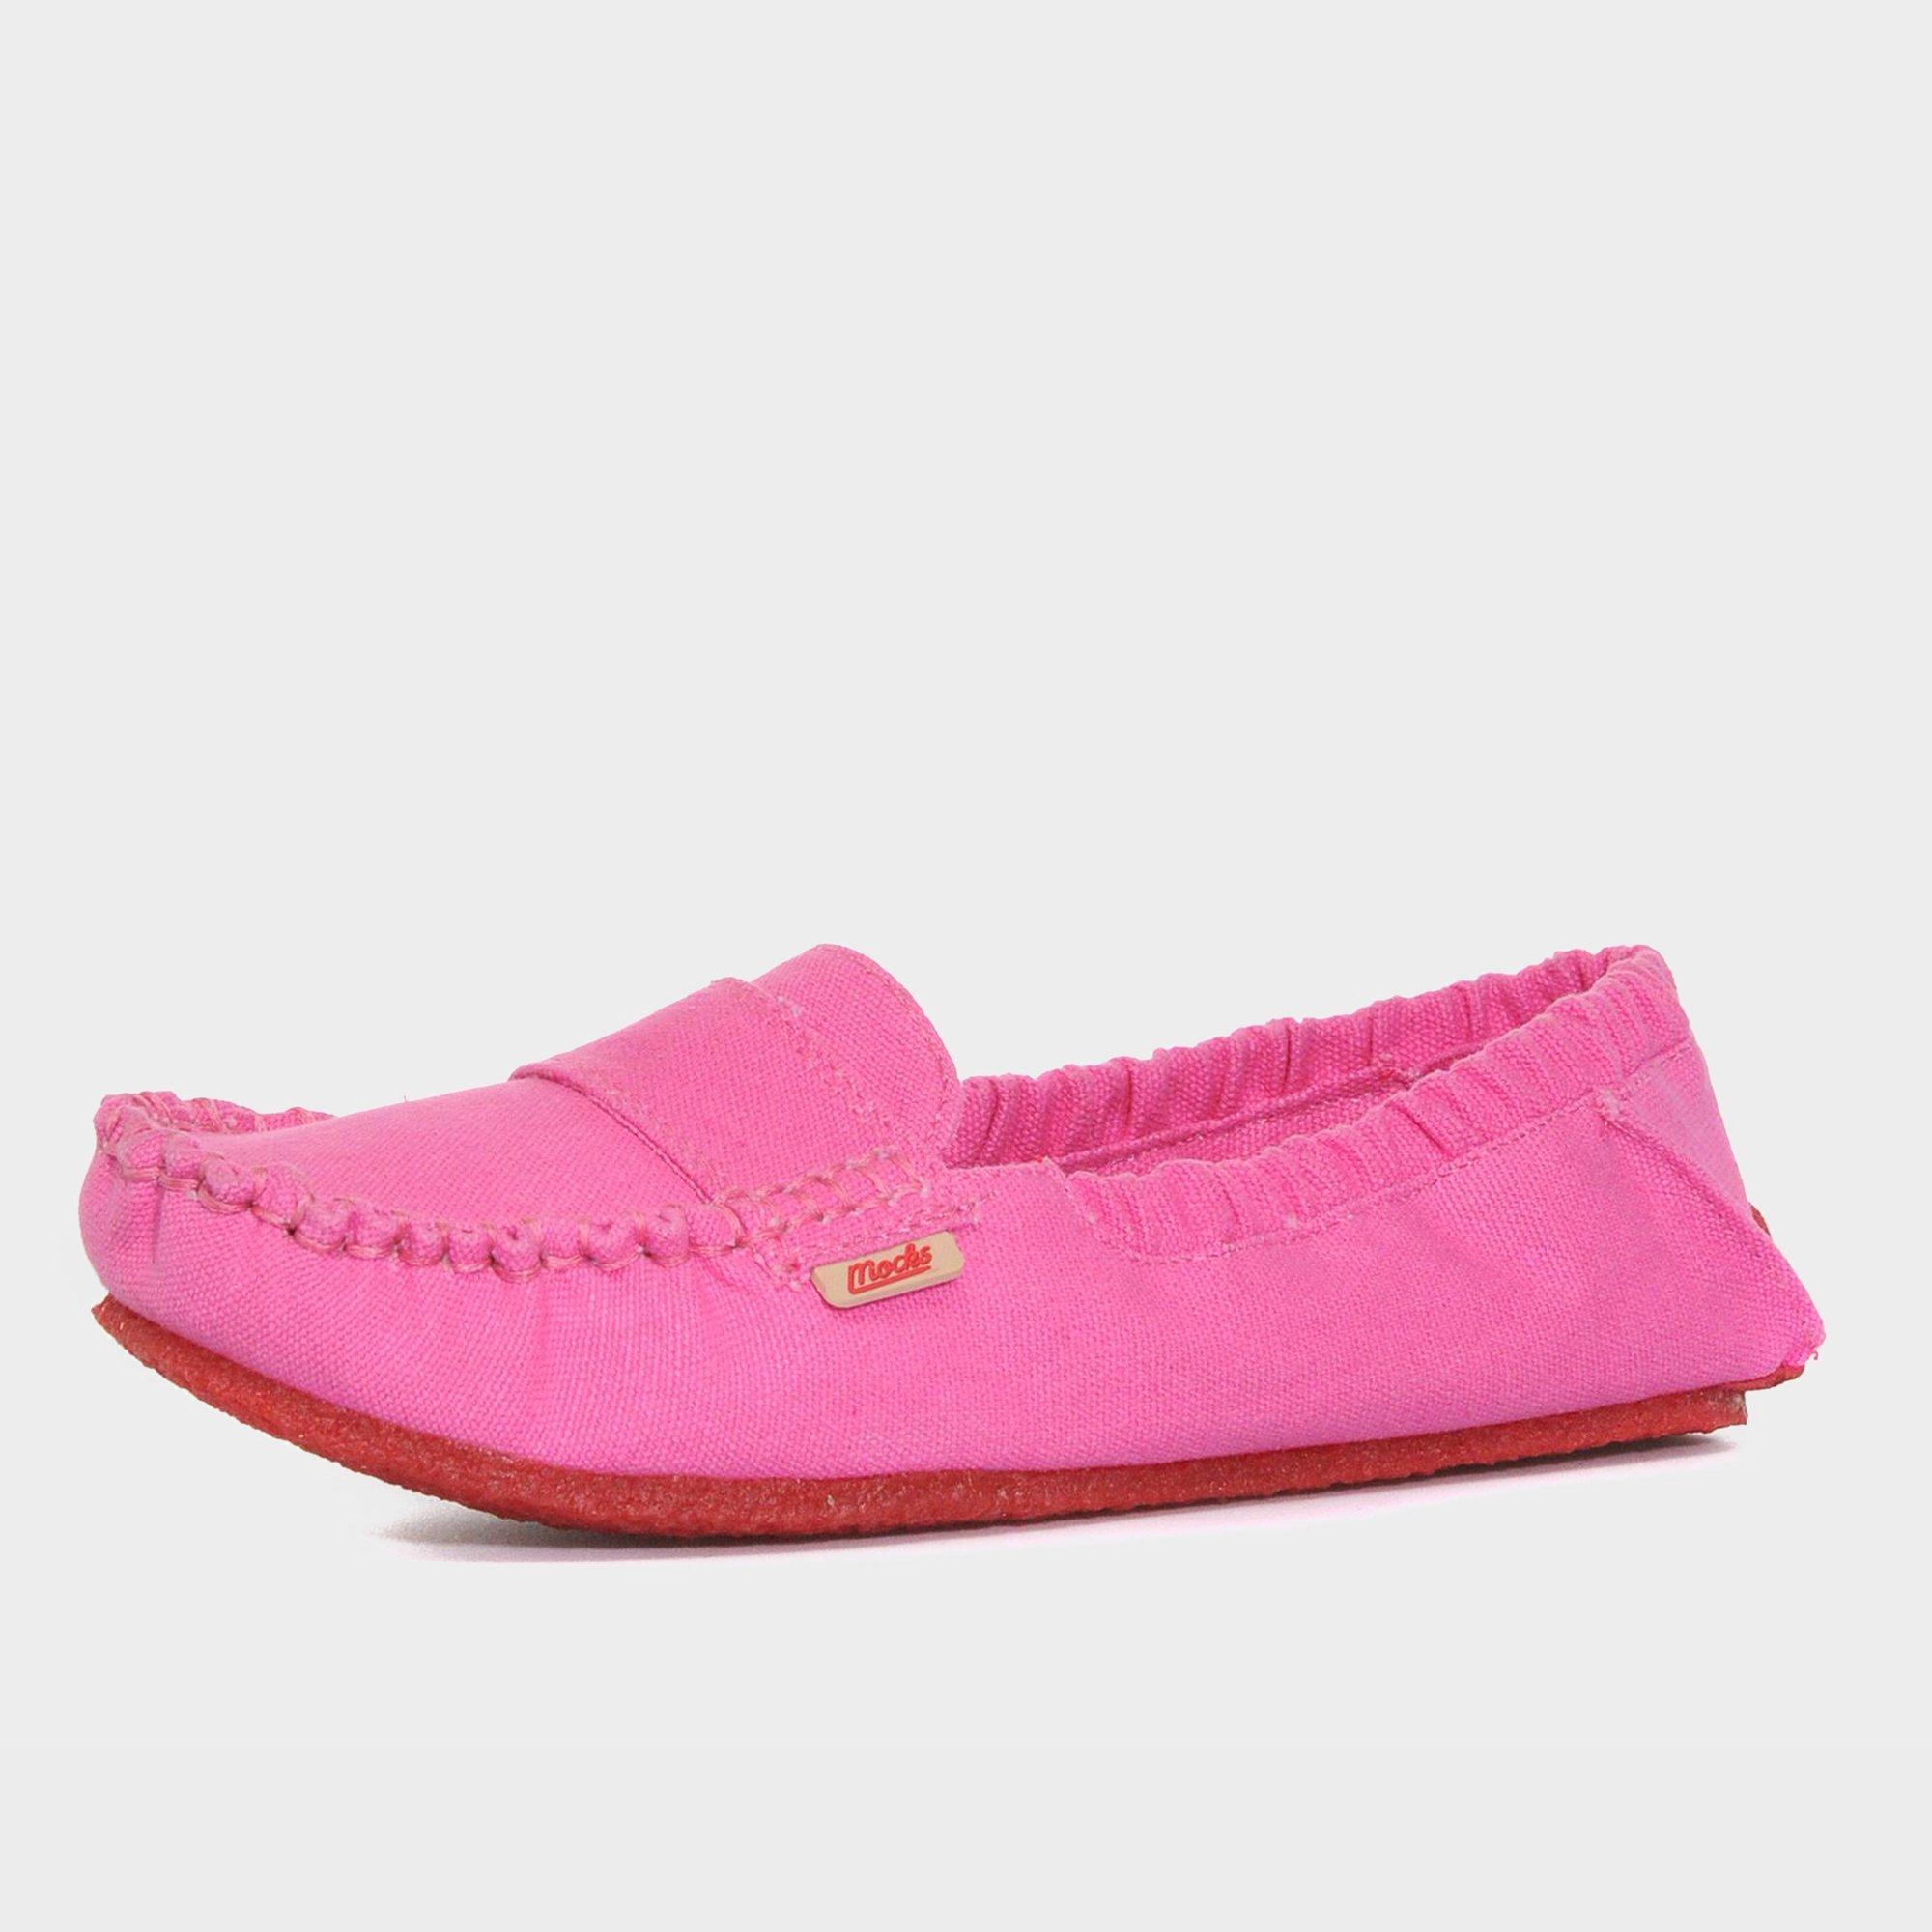 Mocks Mocks Womens Classic Canvas Shoe - Pink, Pink